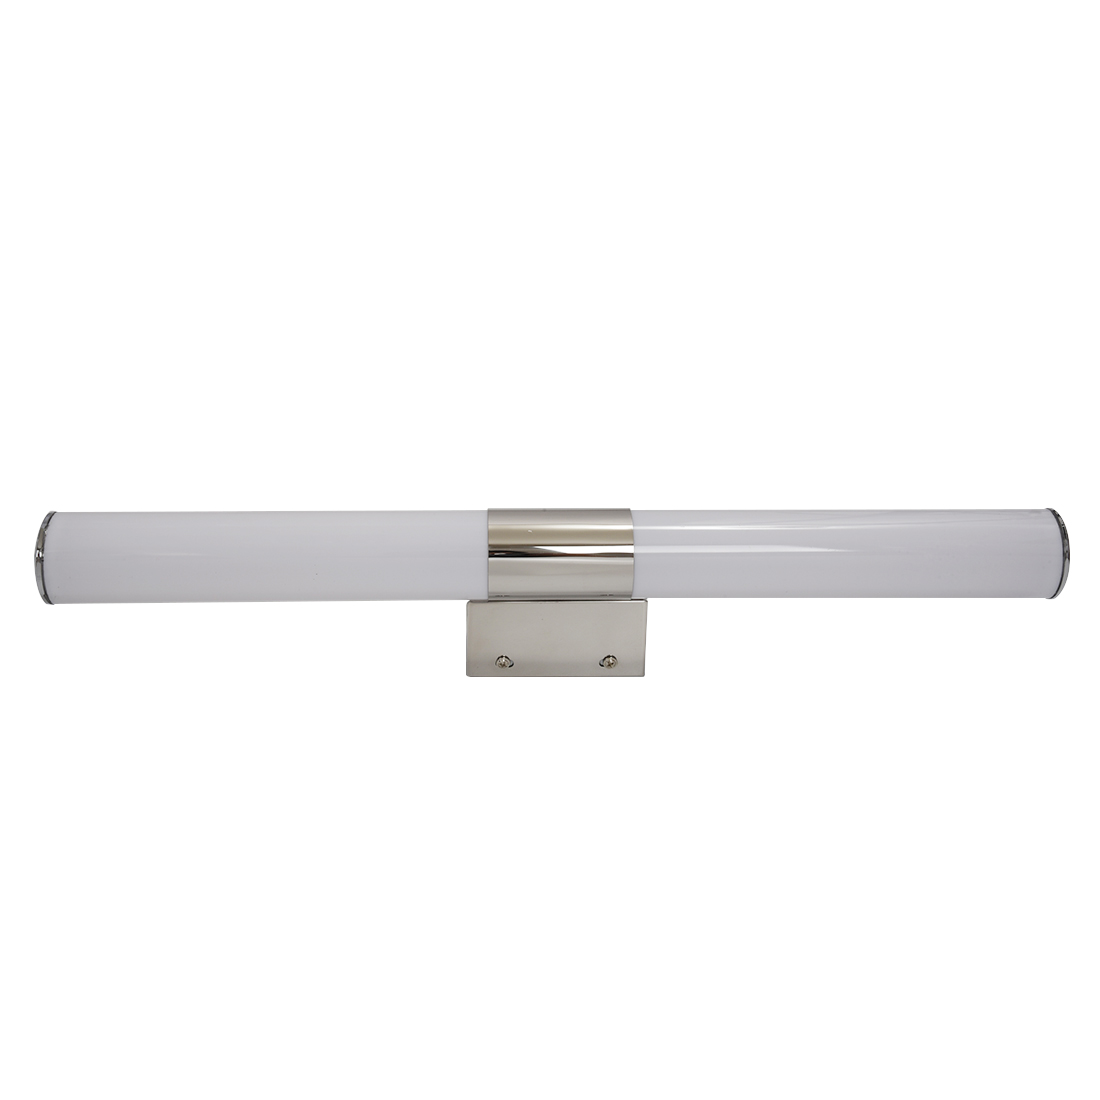 BIFI-14W lamp Mirror Bathroom Wall 850LM 70 LED 2835 SMD Warm White Light AC90-240V Stainless steel Acrylic led mirror light wall front lamps bathroom light 1w 3w 5w 7w 9w 15w samsung chip smd 5050 ac85 265v bulb white warm white uw